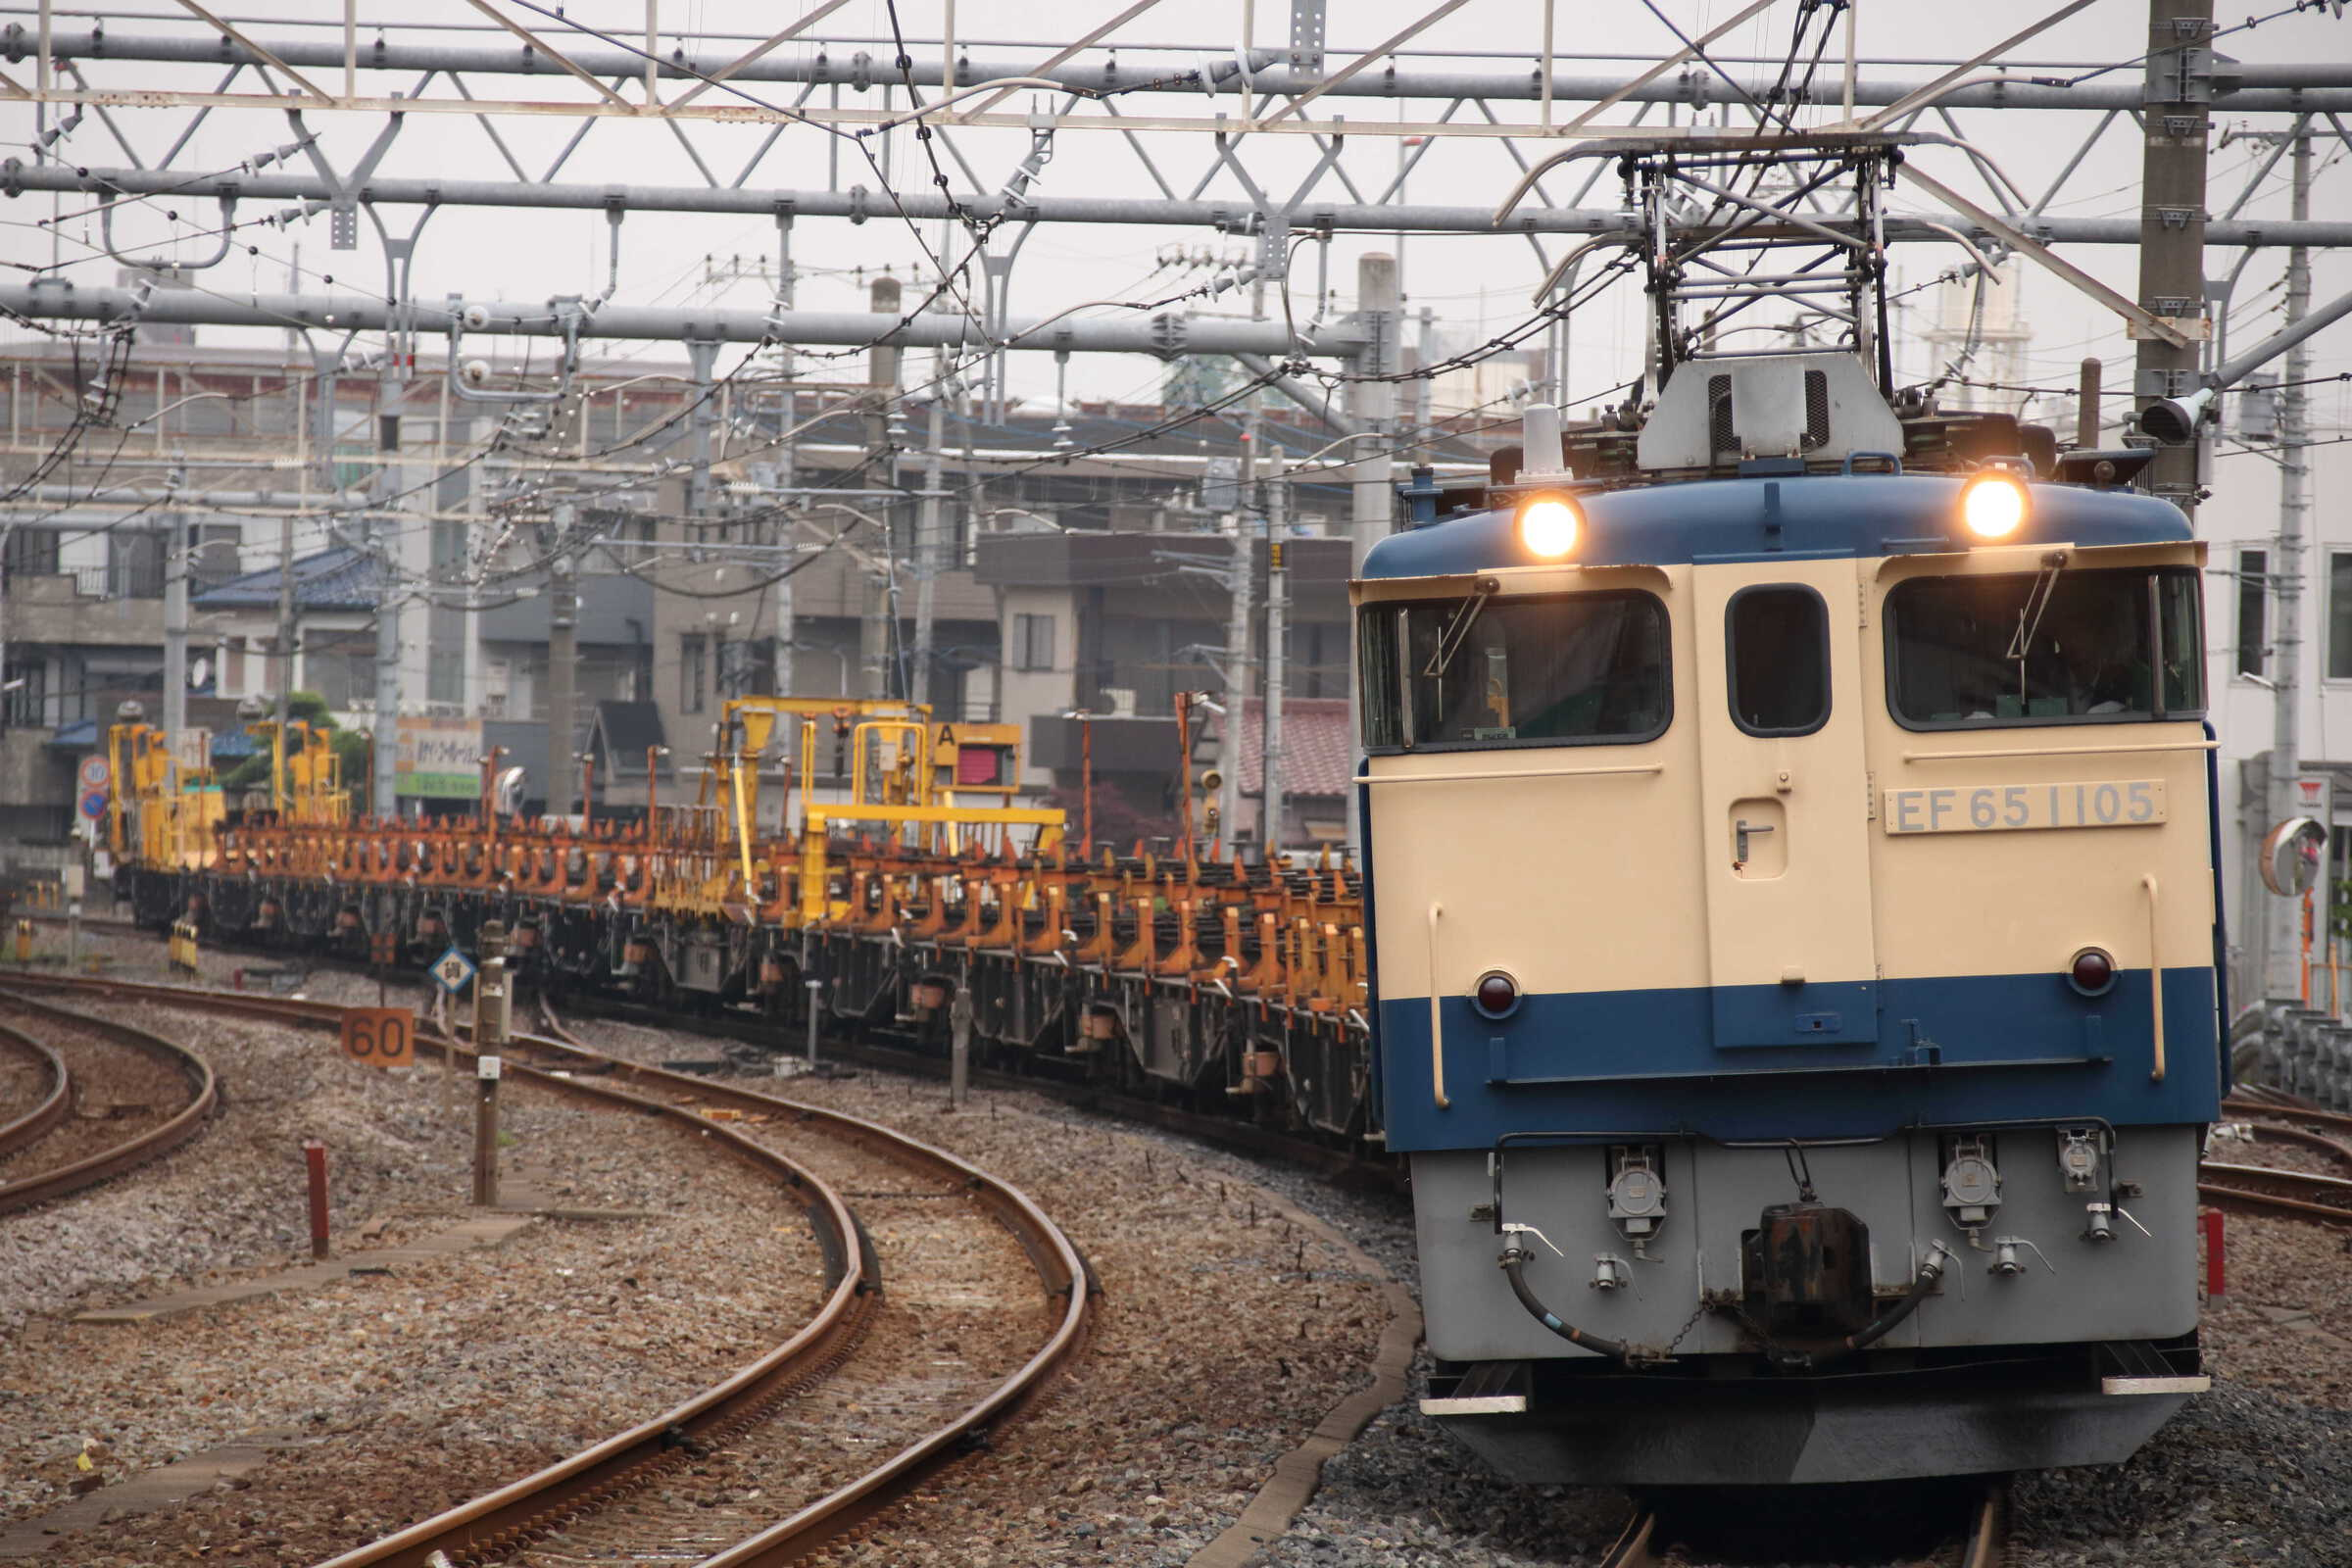 工9774列車 新津工臨返空(新南=4) EF65-1105②[田]+ロンチキA編成13両